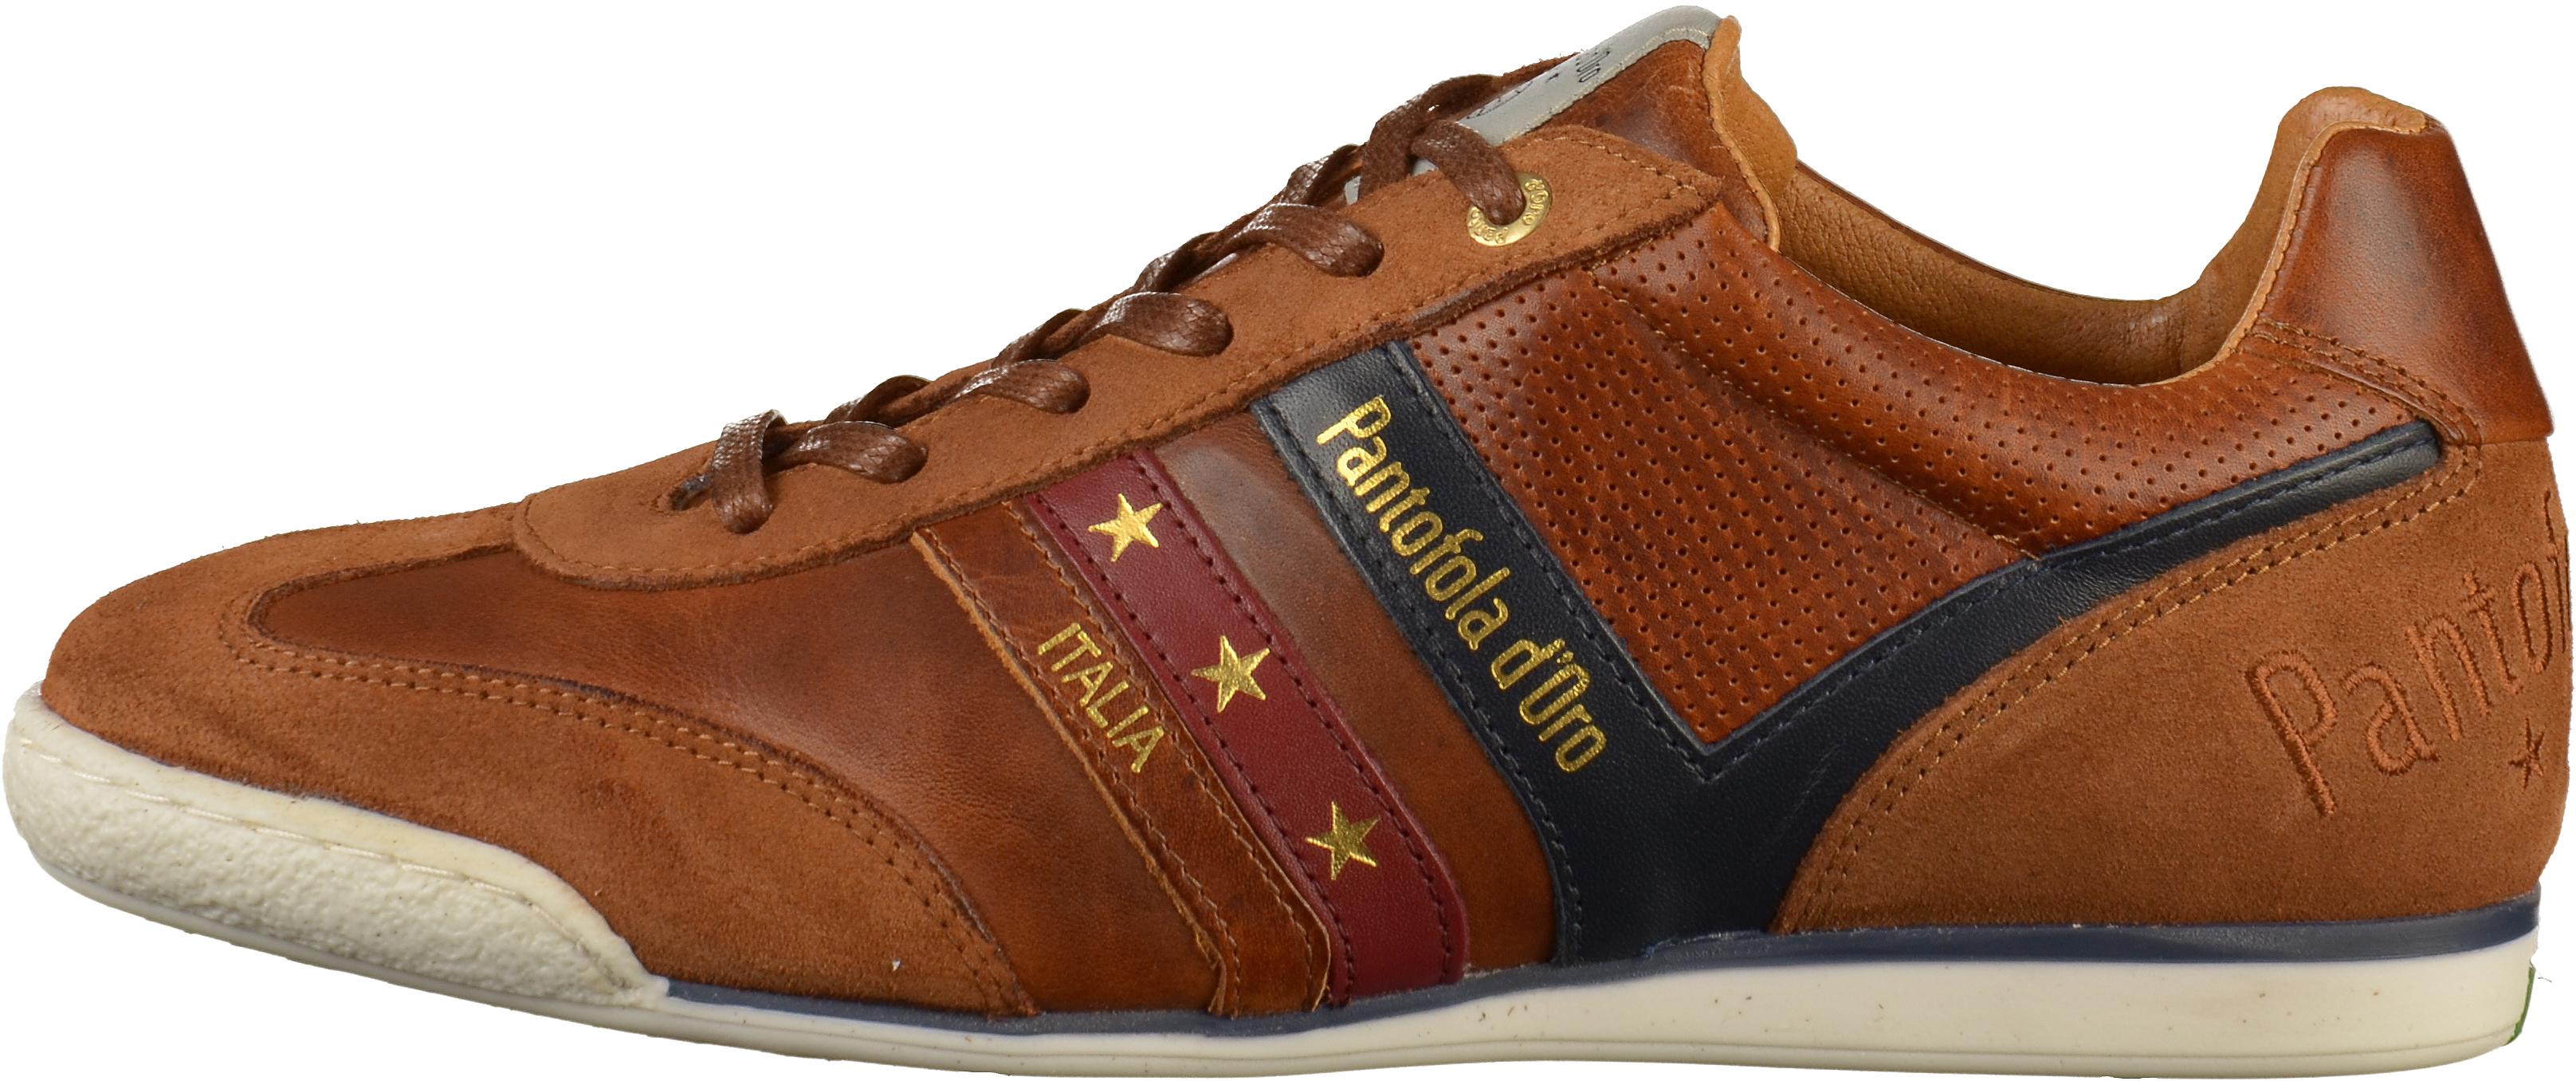 Herrenschuhe Sneaker Größe 48 Pantofola d'Oro